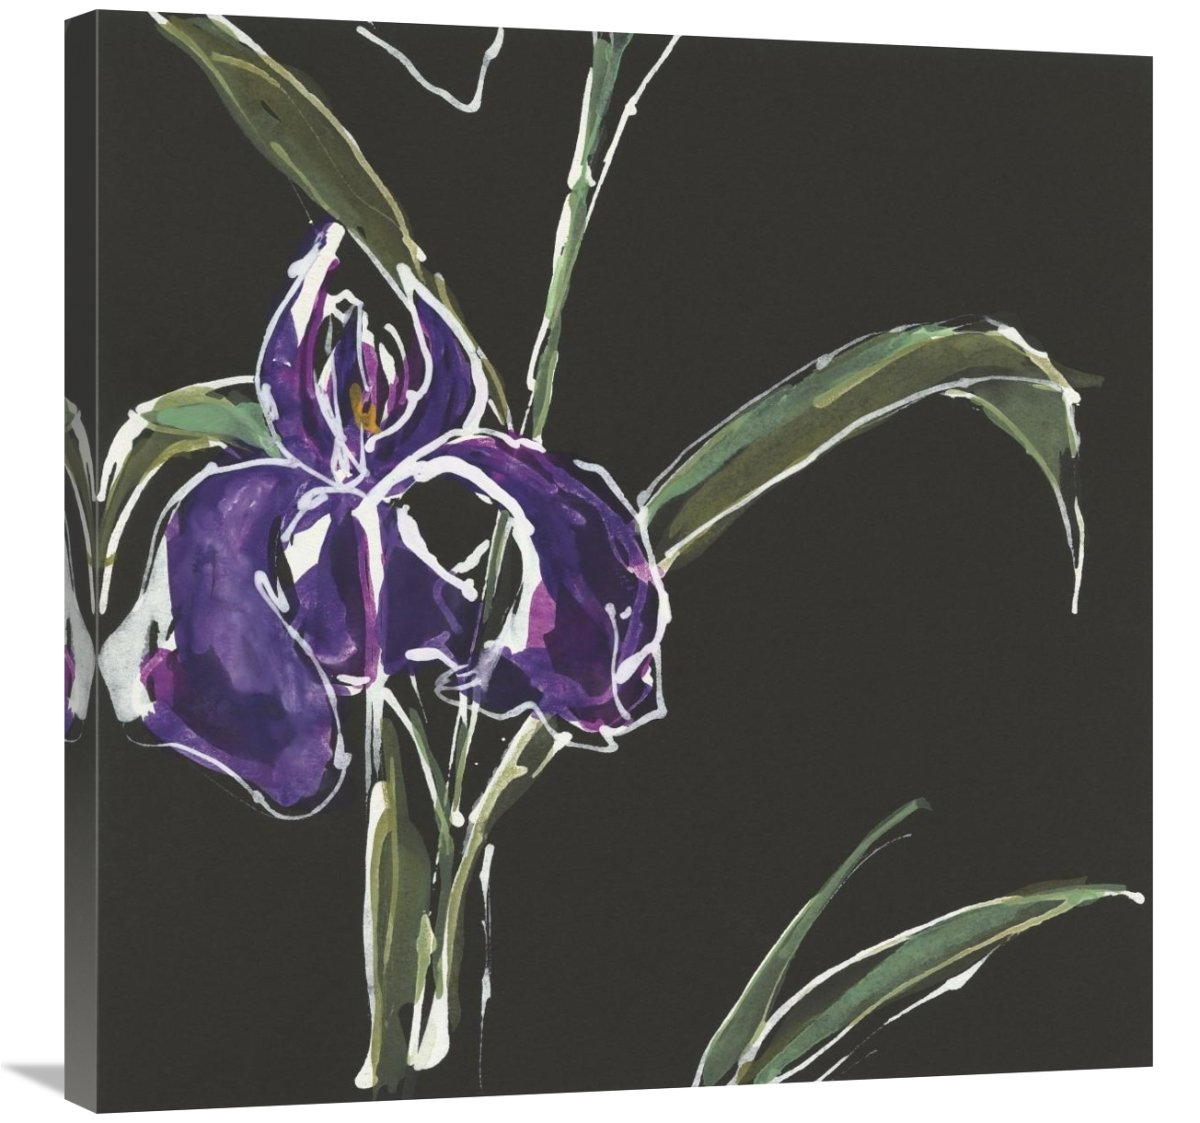 Global Gallery Chris Paschke Iris on Black II Canvas Artwork 30 x 30